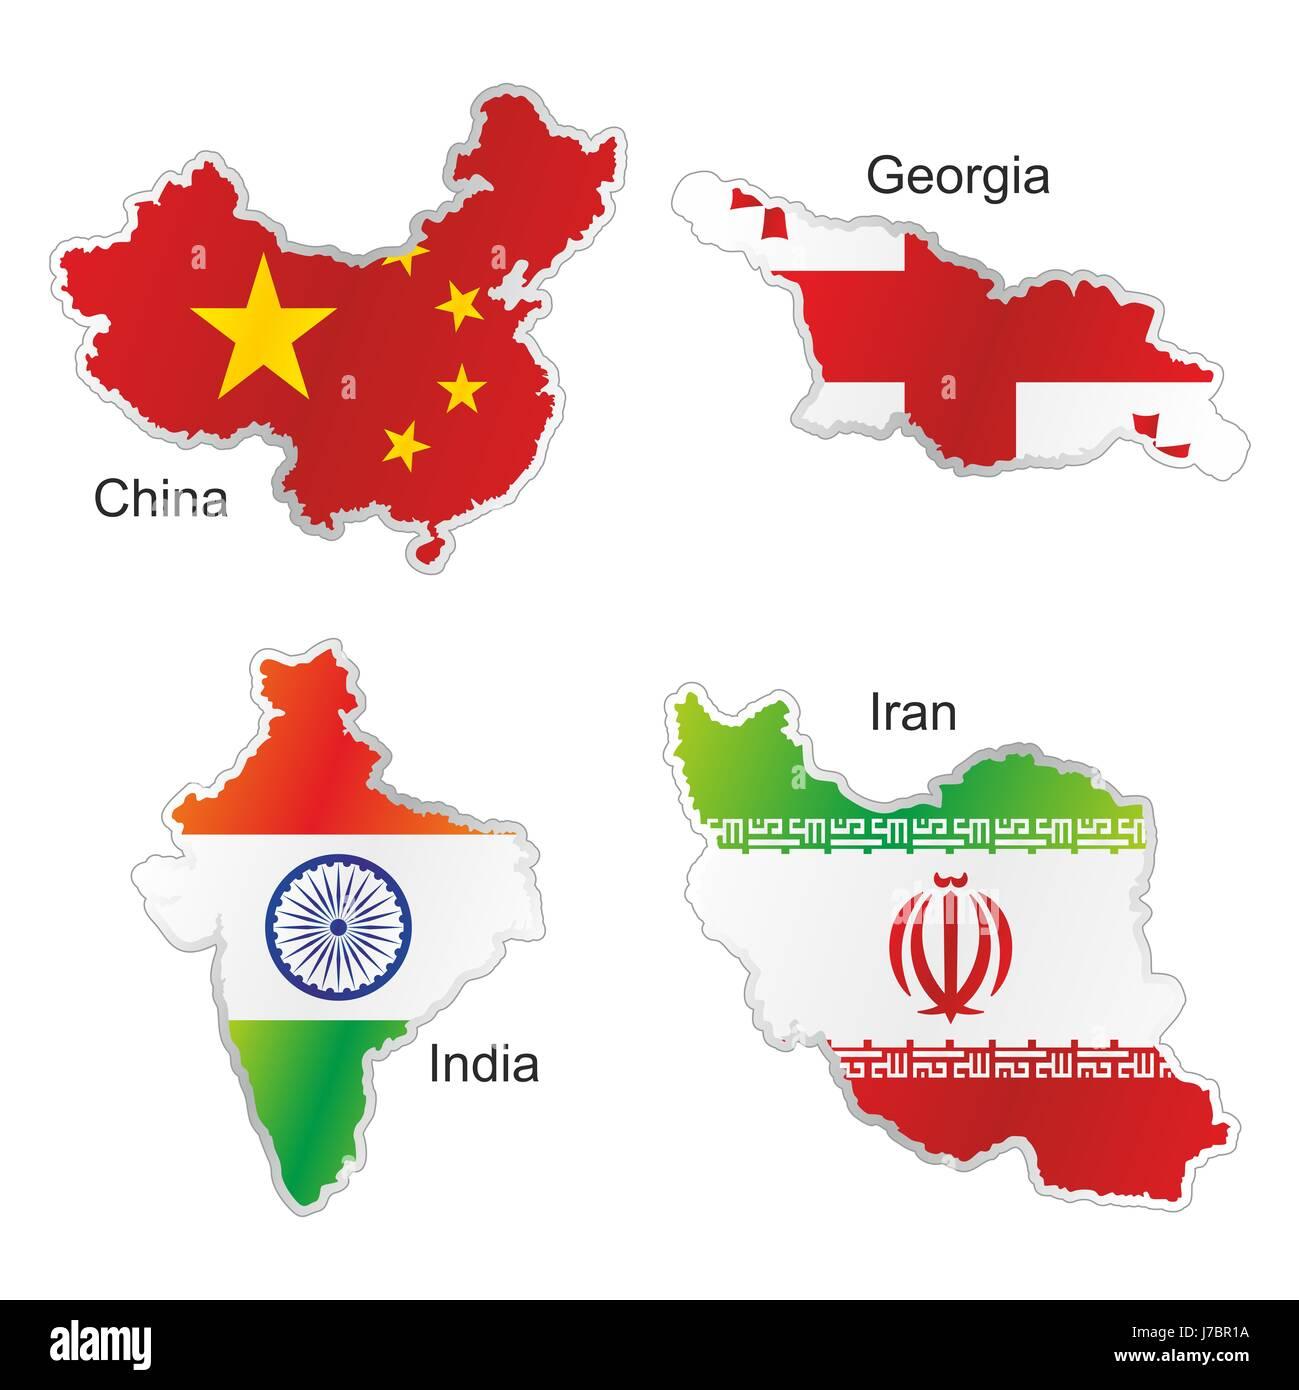 Asia india flag china georgia iran map atlas map of the world asia india flag china georgia iran map atlas map of the world isolated currency gumiabroncs Image collections